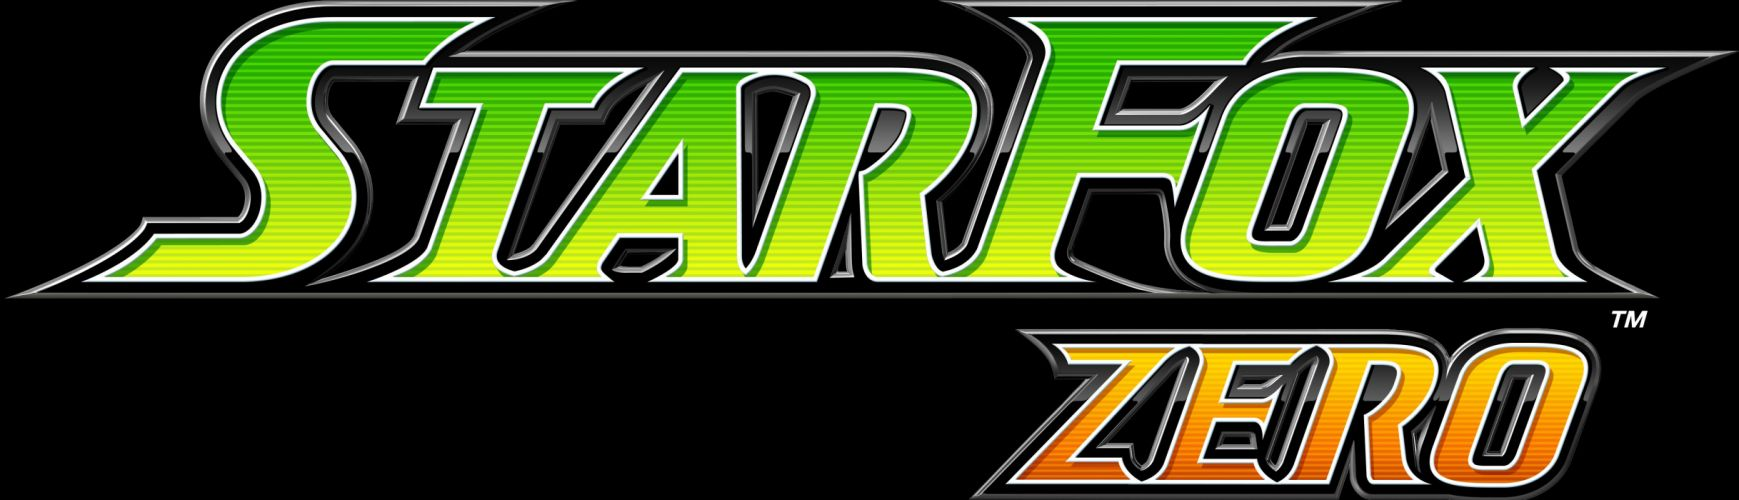 STAR FOX ZERO Suta Fokkusu Zero scrolling shooter action foxes nintendi wii fighting 1sfz sci-fi futuristic poster wallpaper